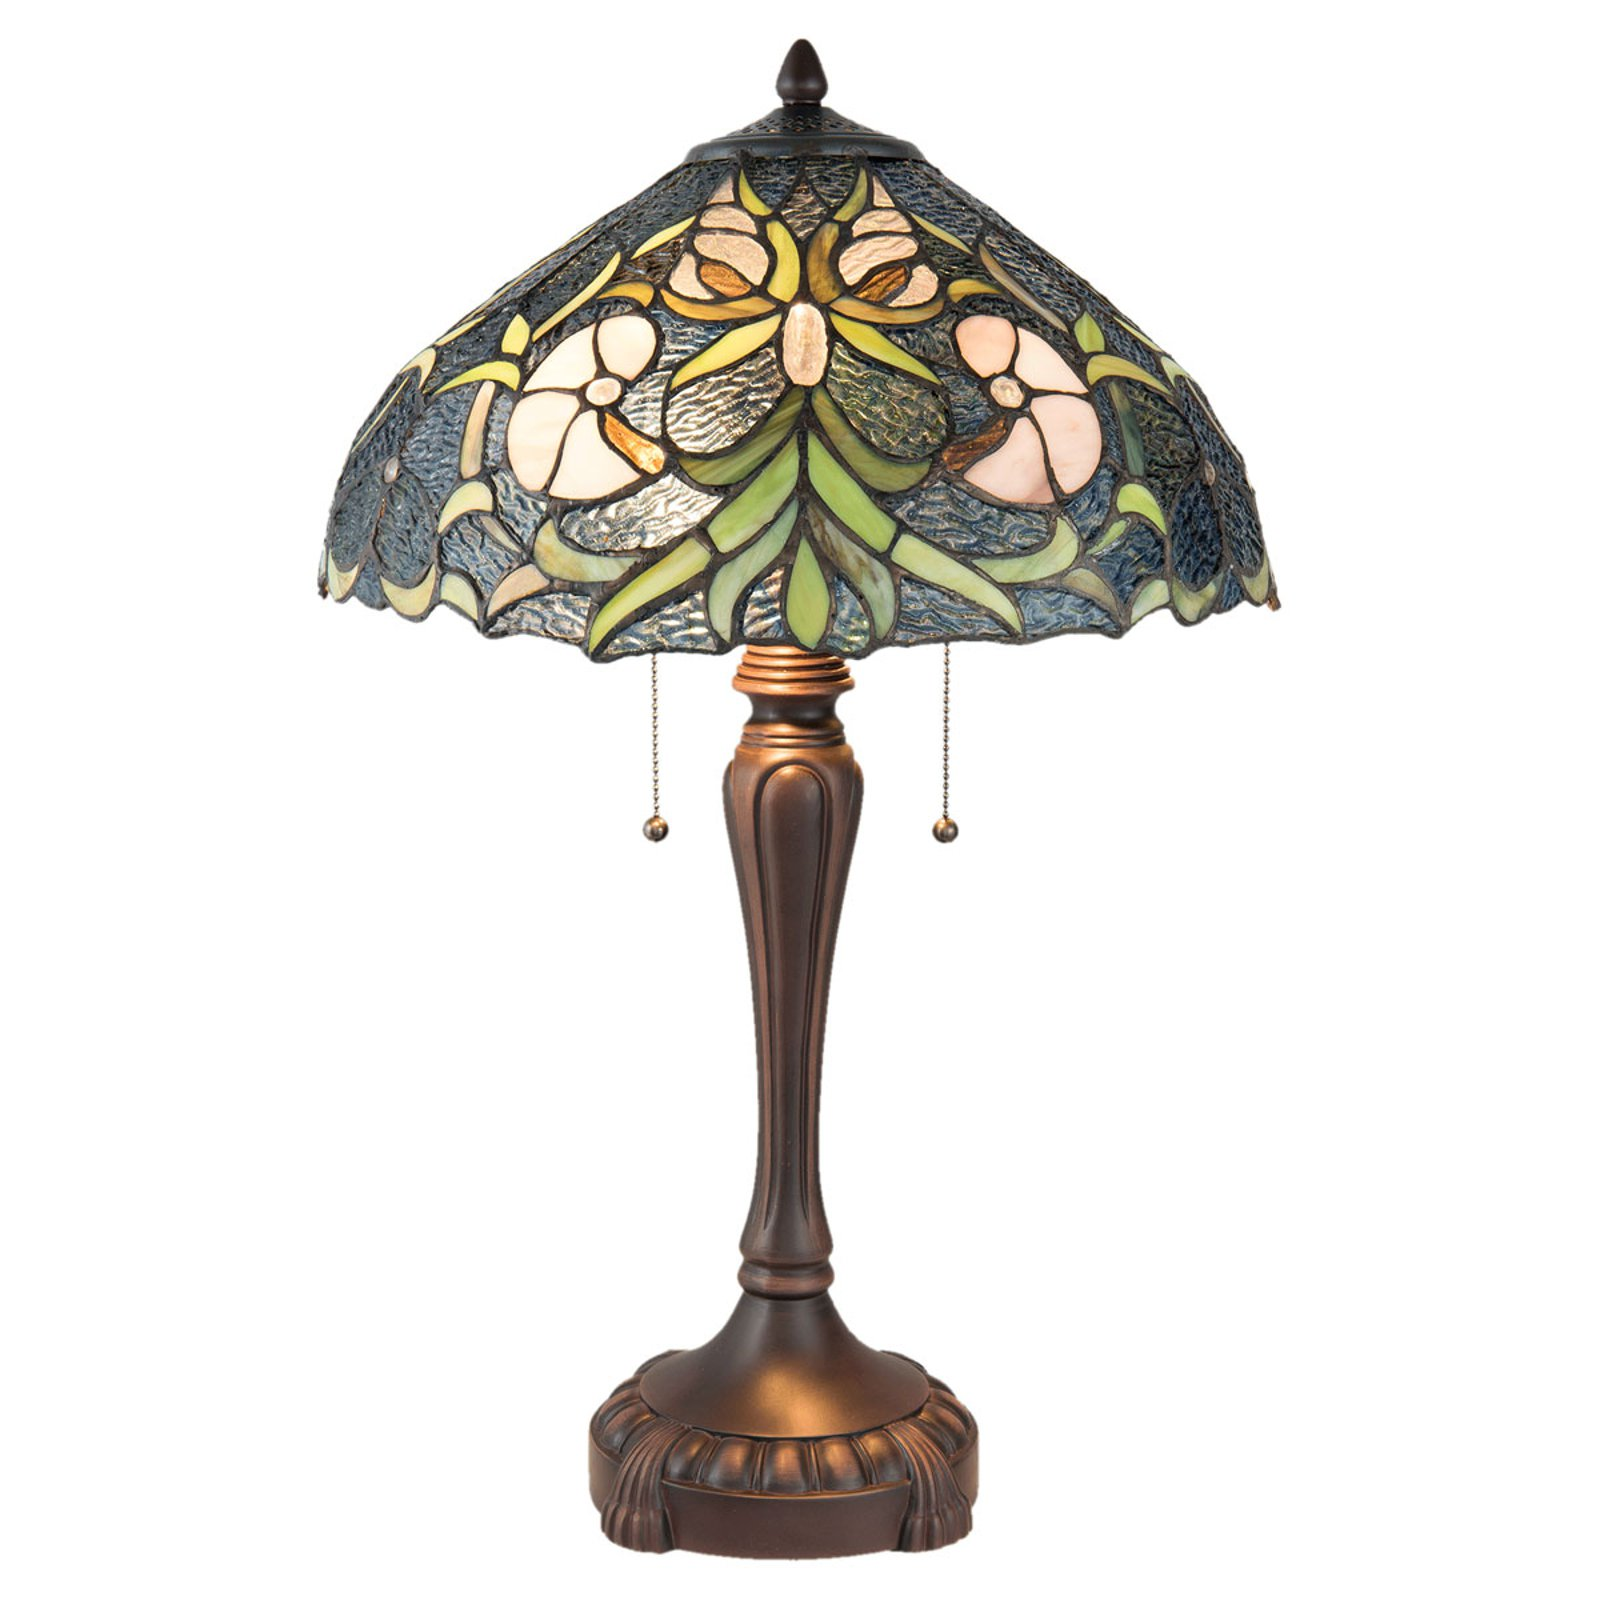 5922 bordlampe i Tiffany-stil, 2 lyskilder, blå